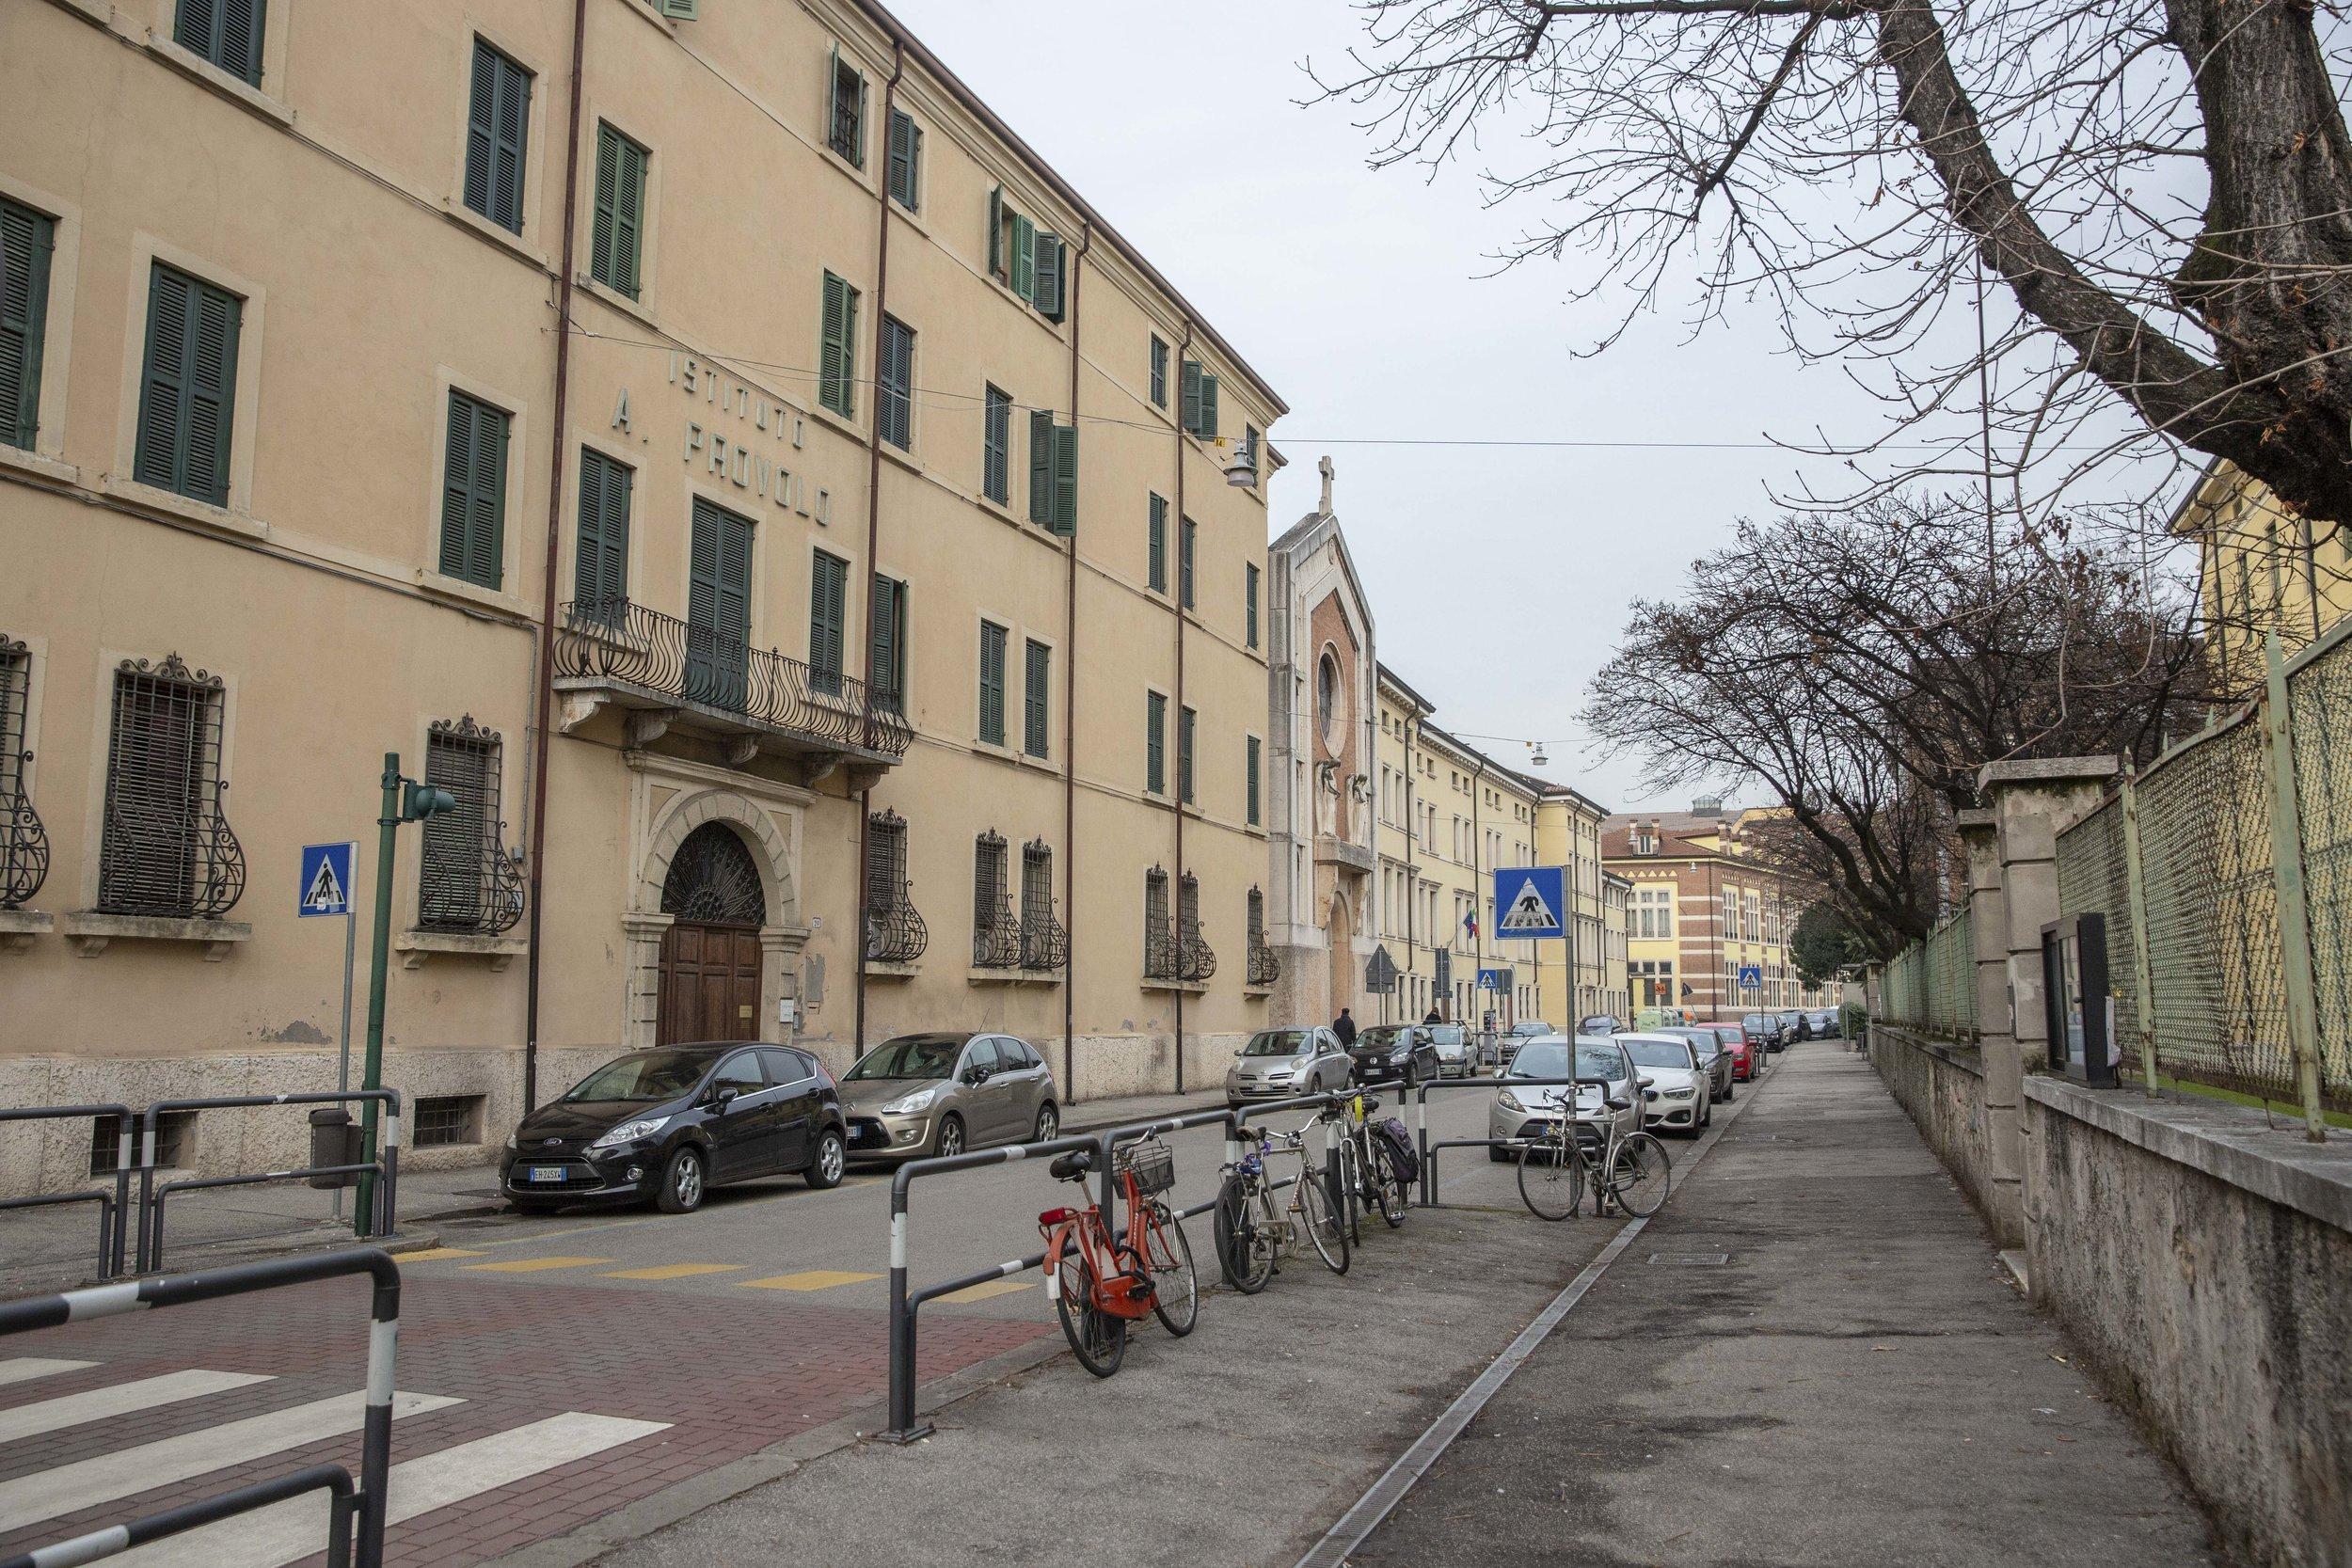 FRANCESCAVOLPI_THENEWYORKTIMES_ITALY _8.jpg